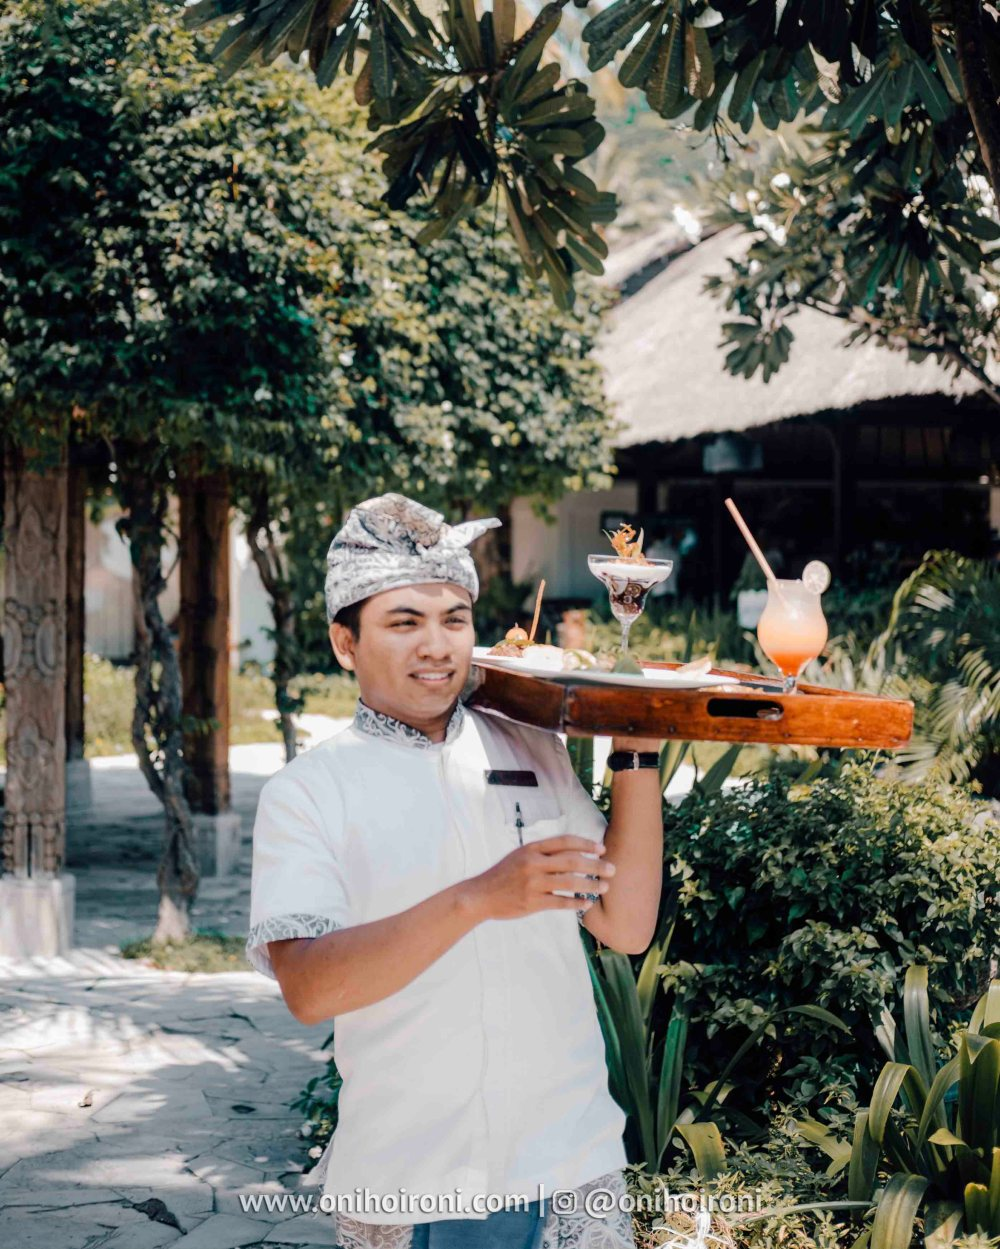 olah-olah restaurant Sudamala Suites & Villas Senggigi, Lombok